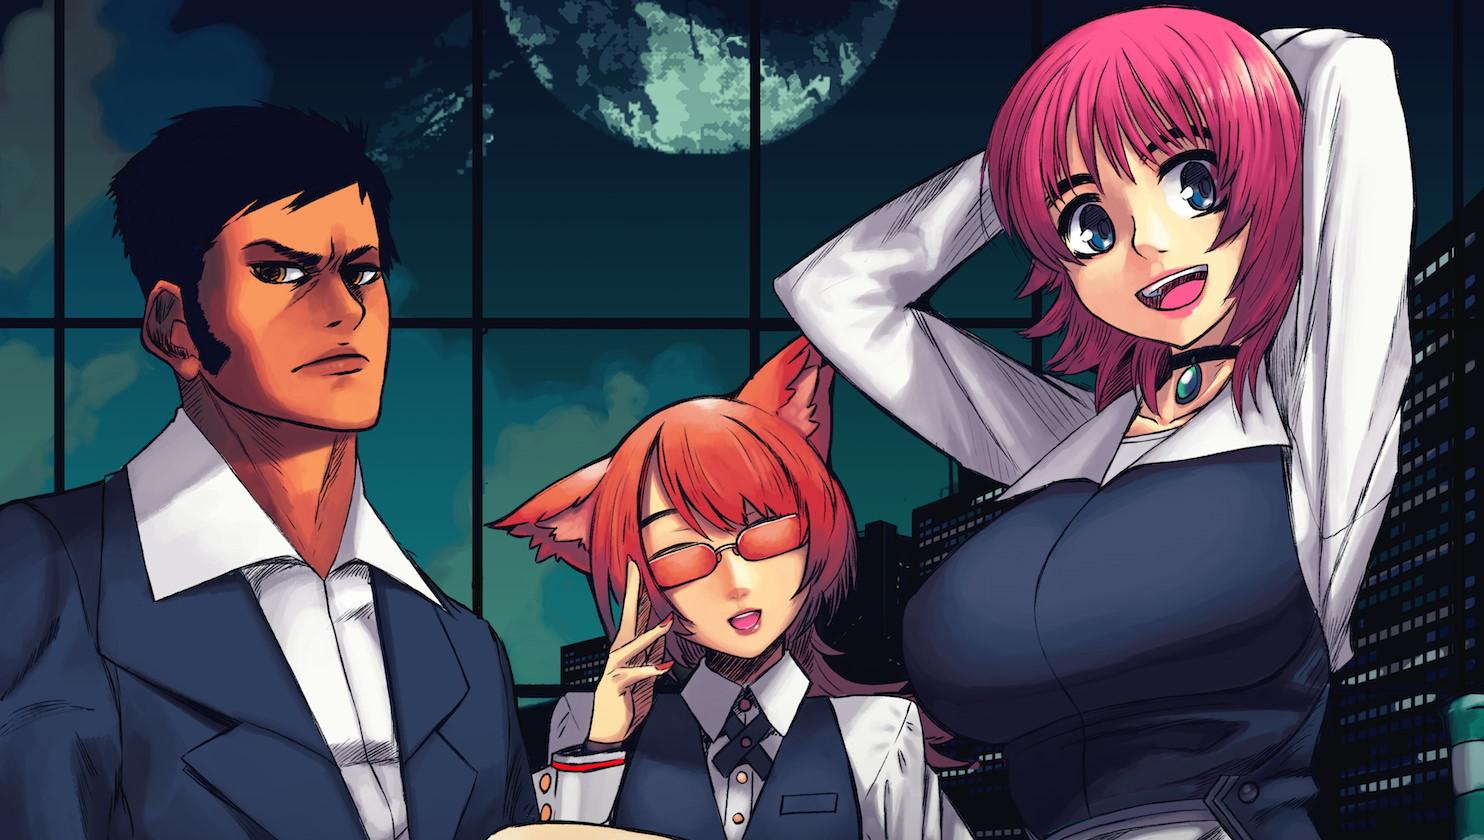 Cyberpunk bartending game N1RV Ann-A is delayed indefinitely